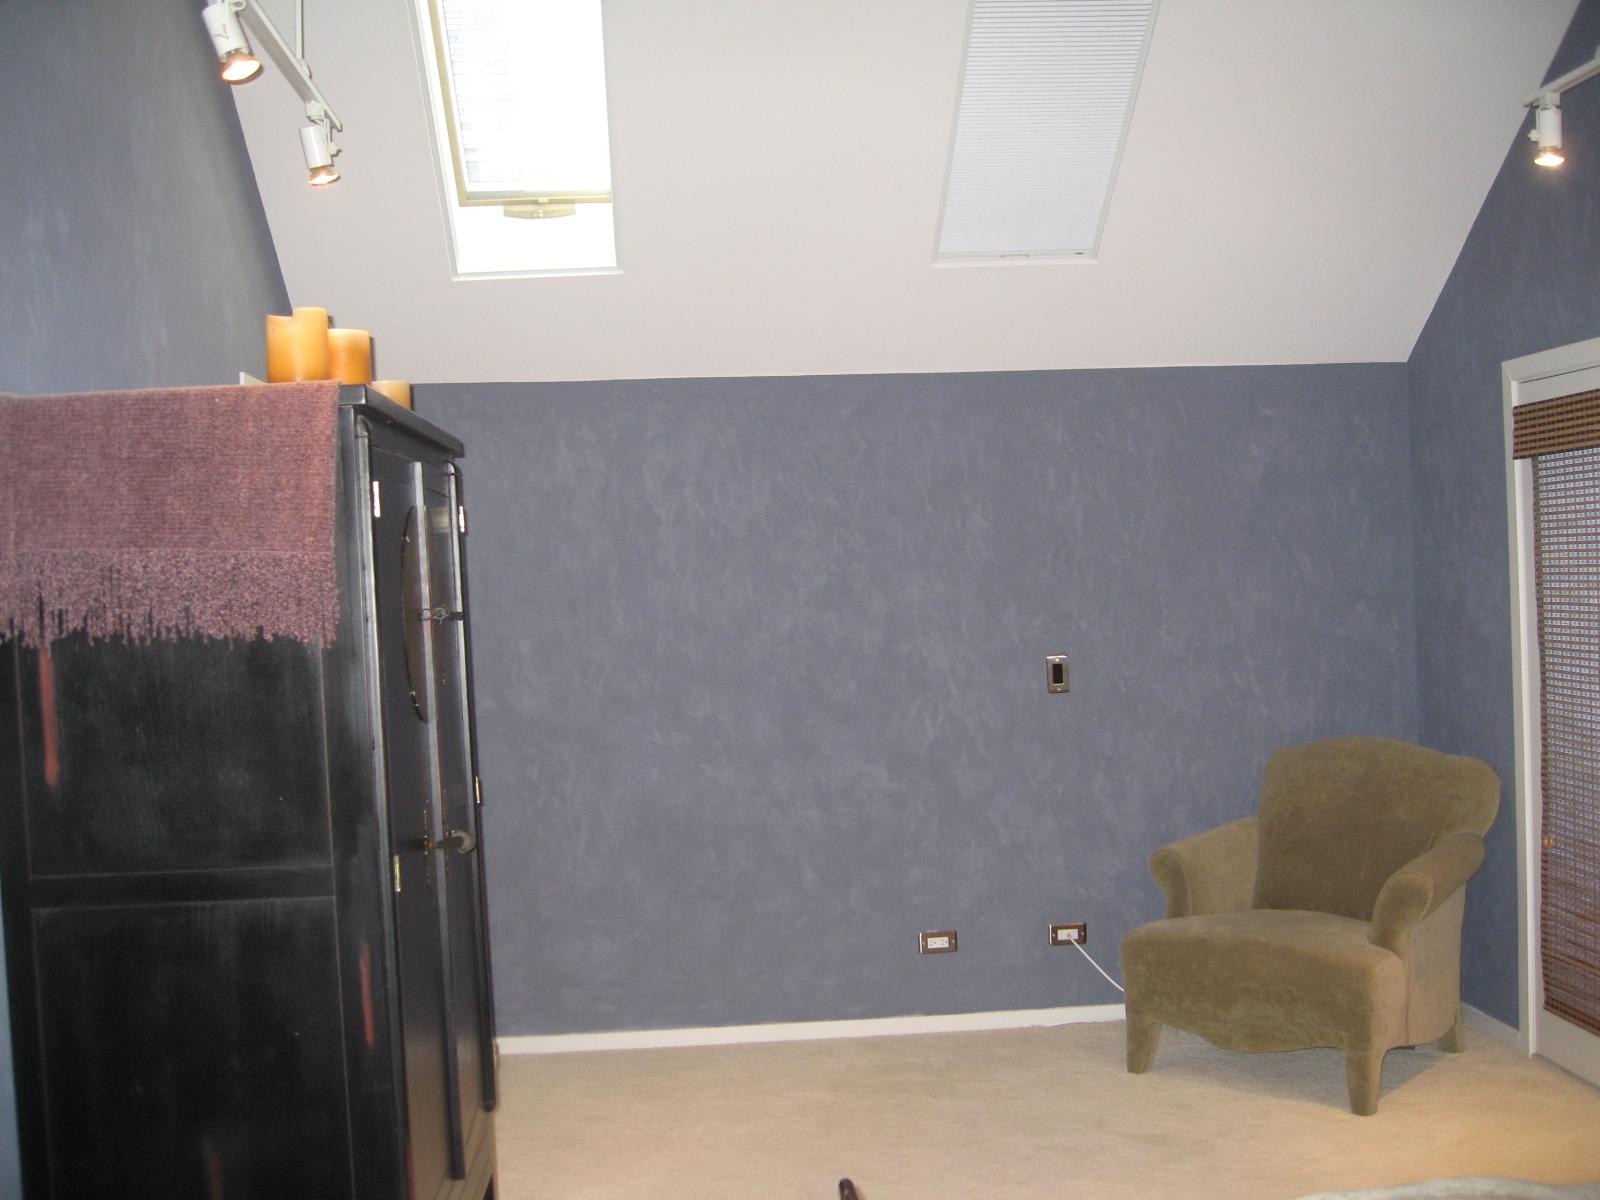 cousin bedroom before.JPG